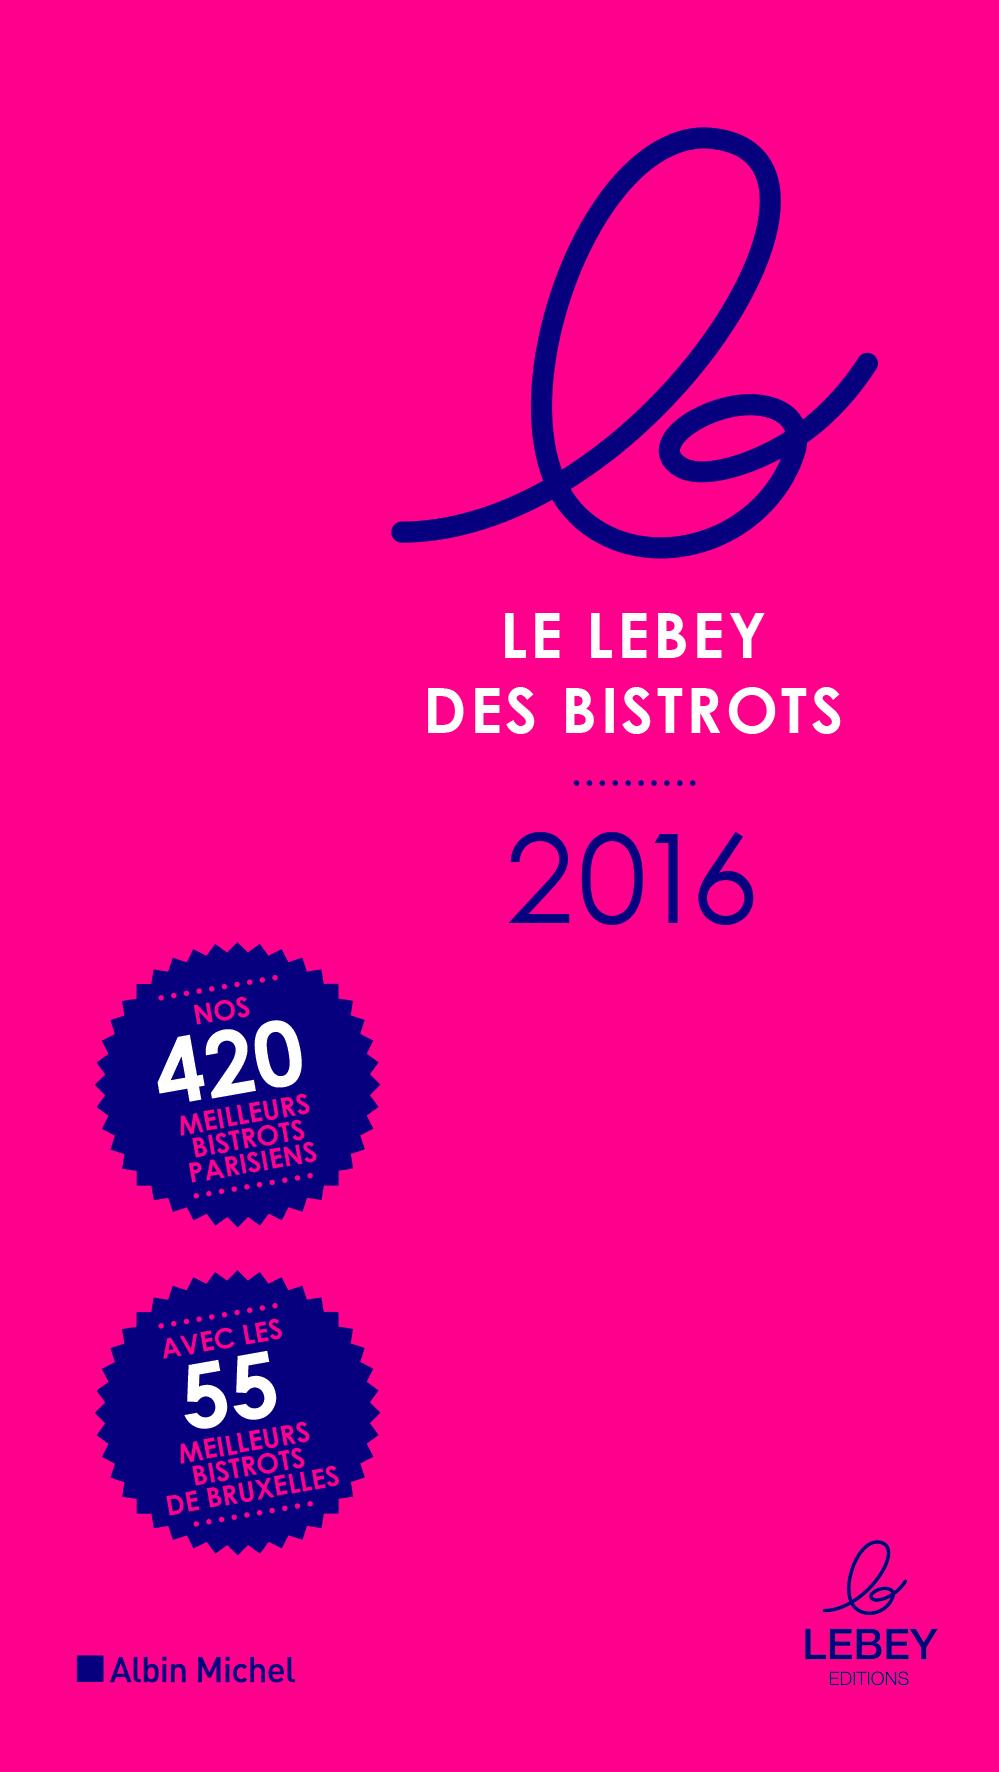 Guide LEbey 2016 - Sortie le 7 avril 2016 en librairie